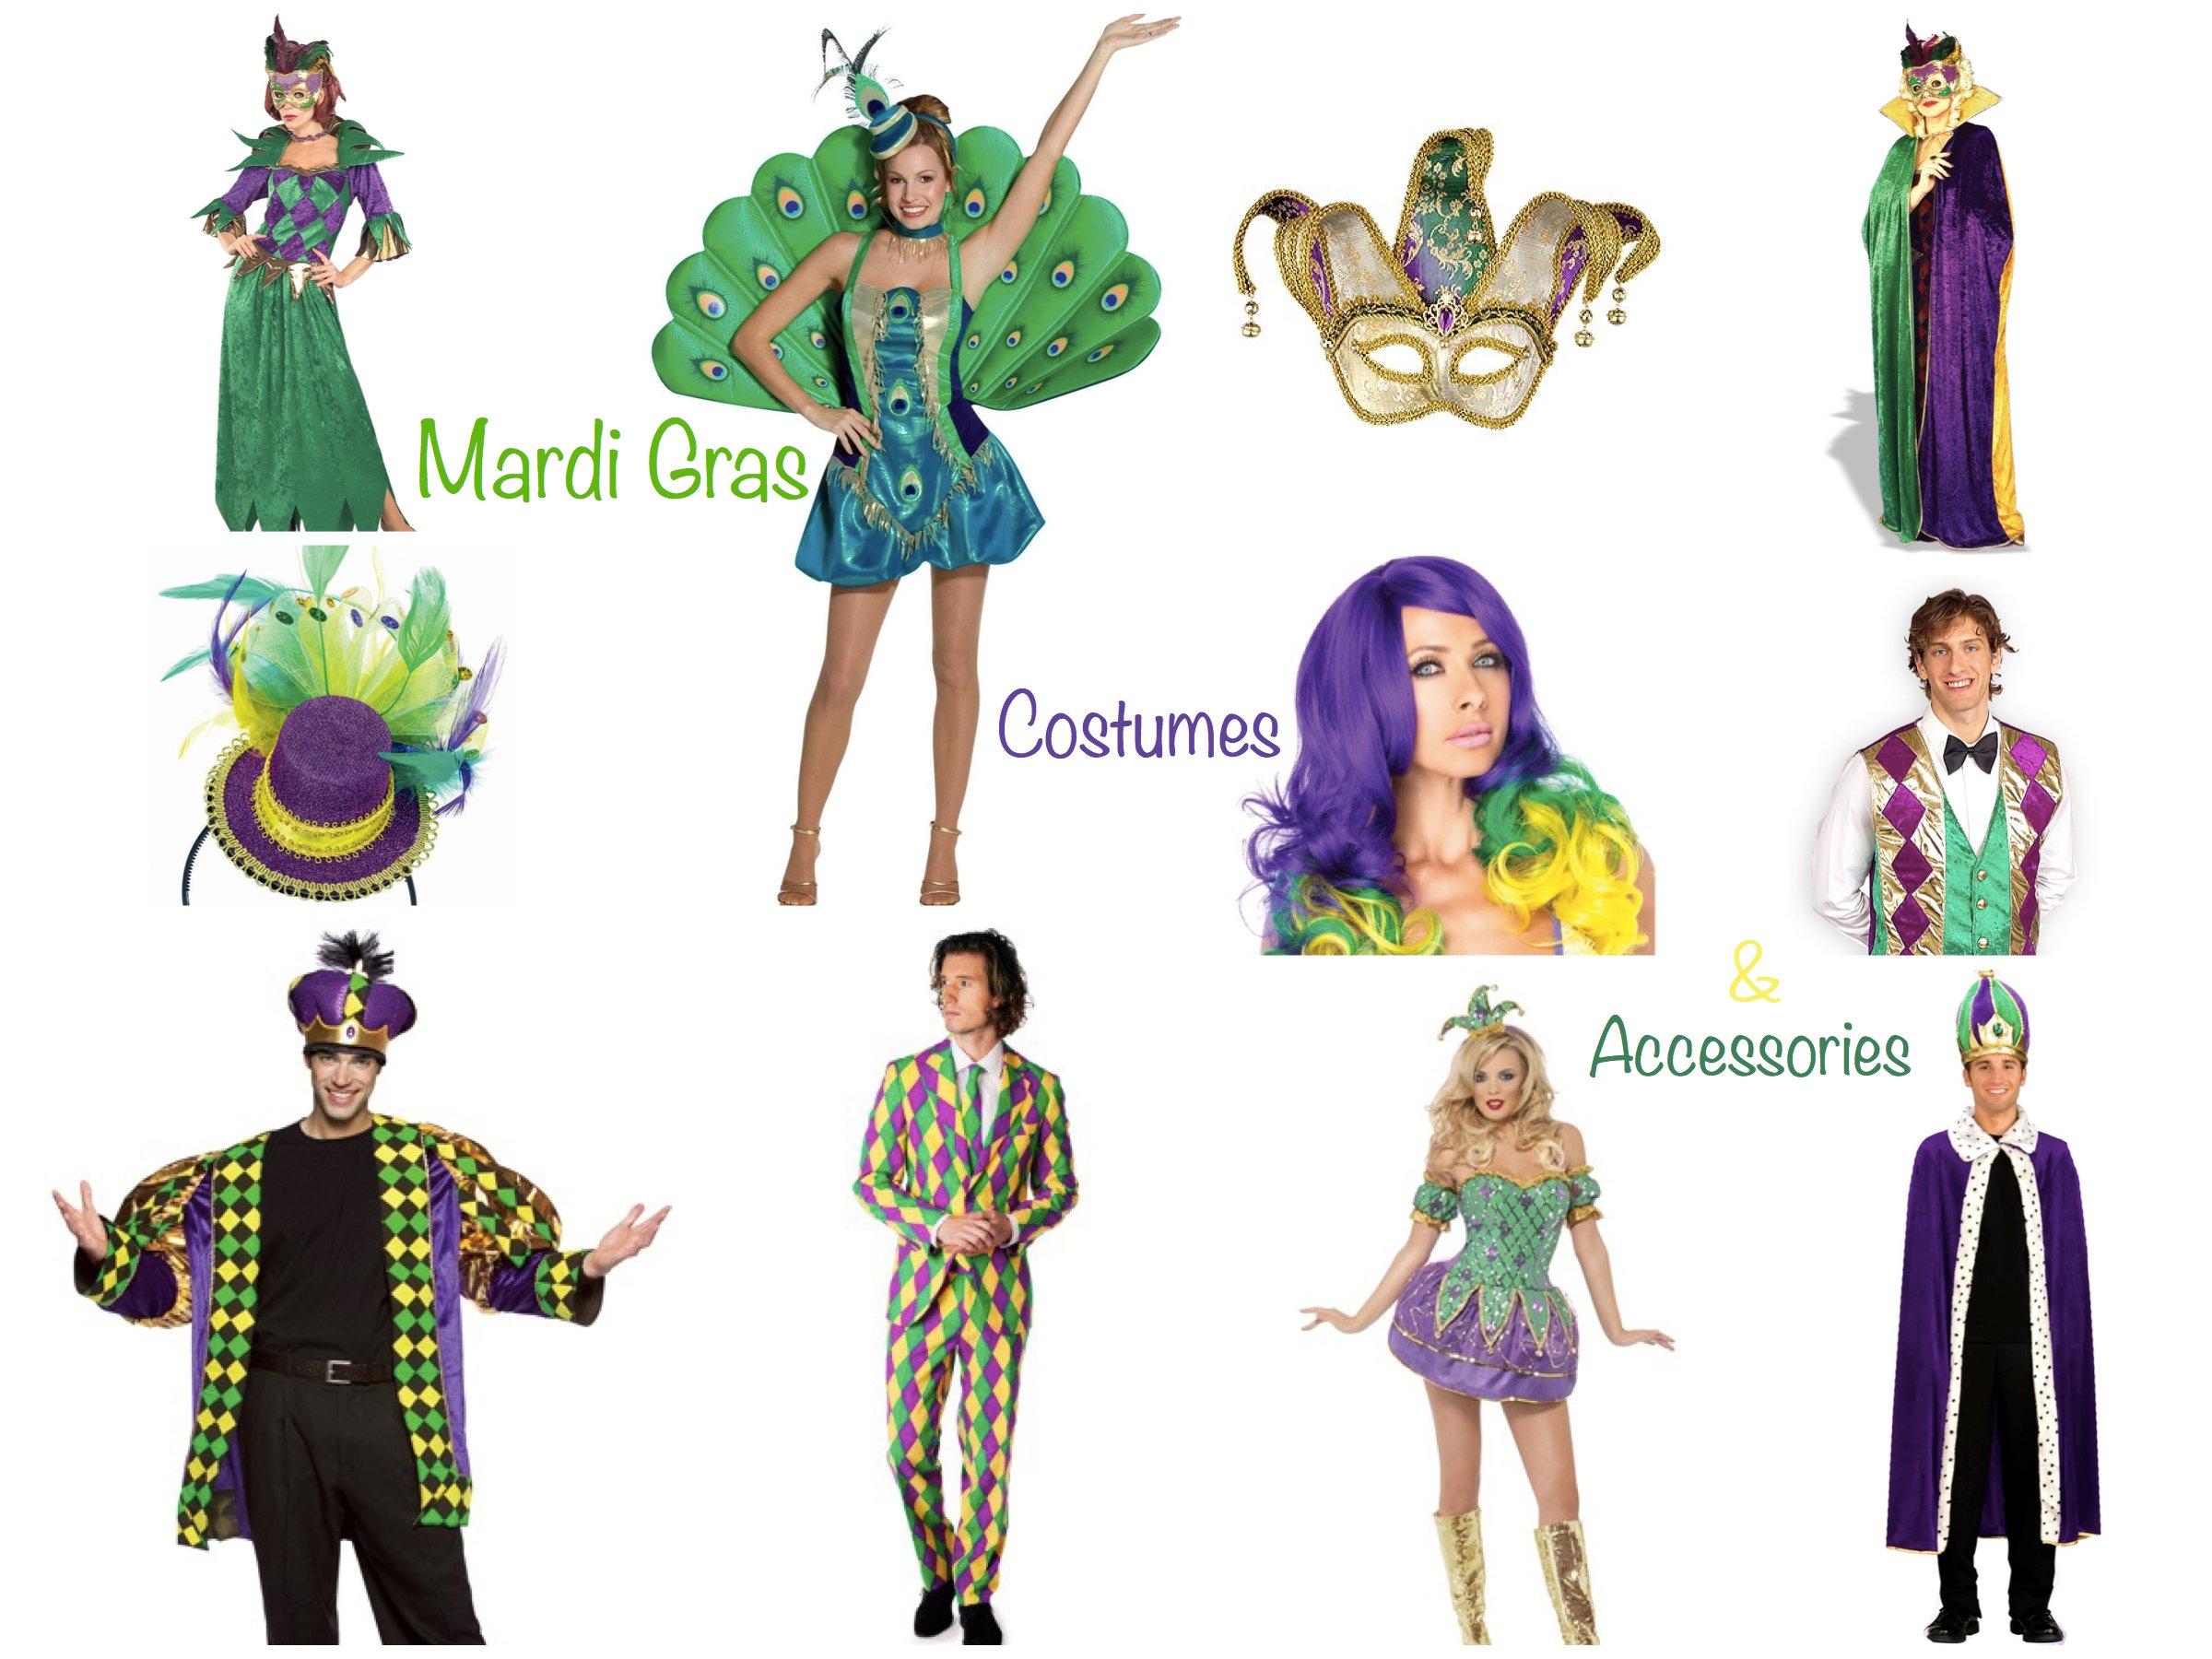 Mardi Gras Costumes Accessories